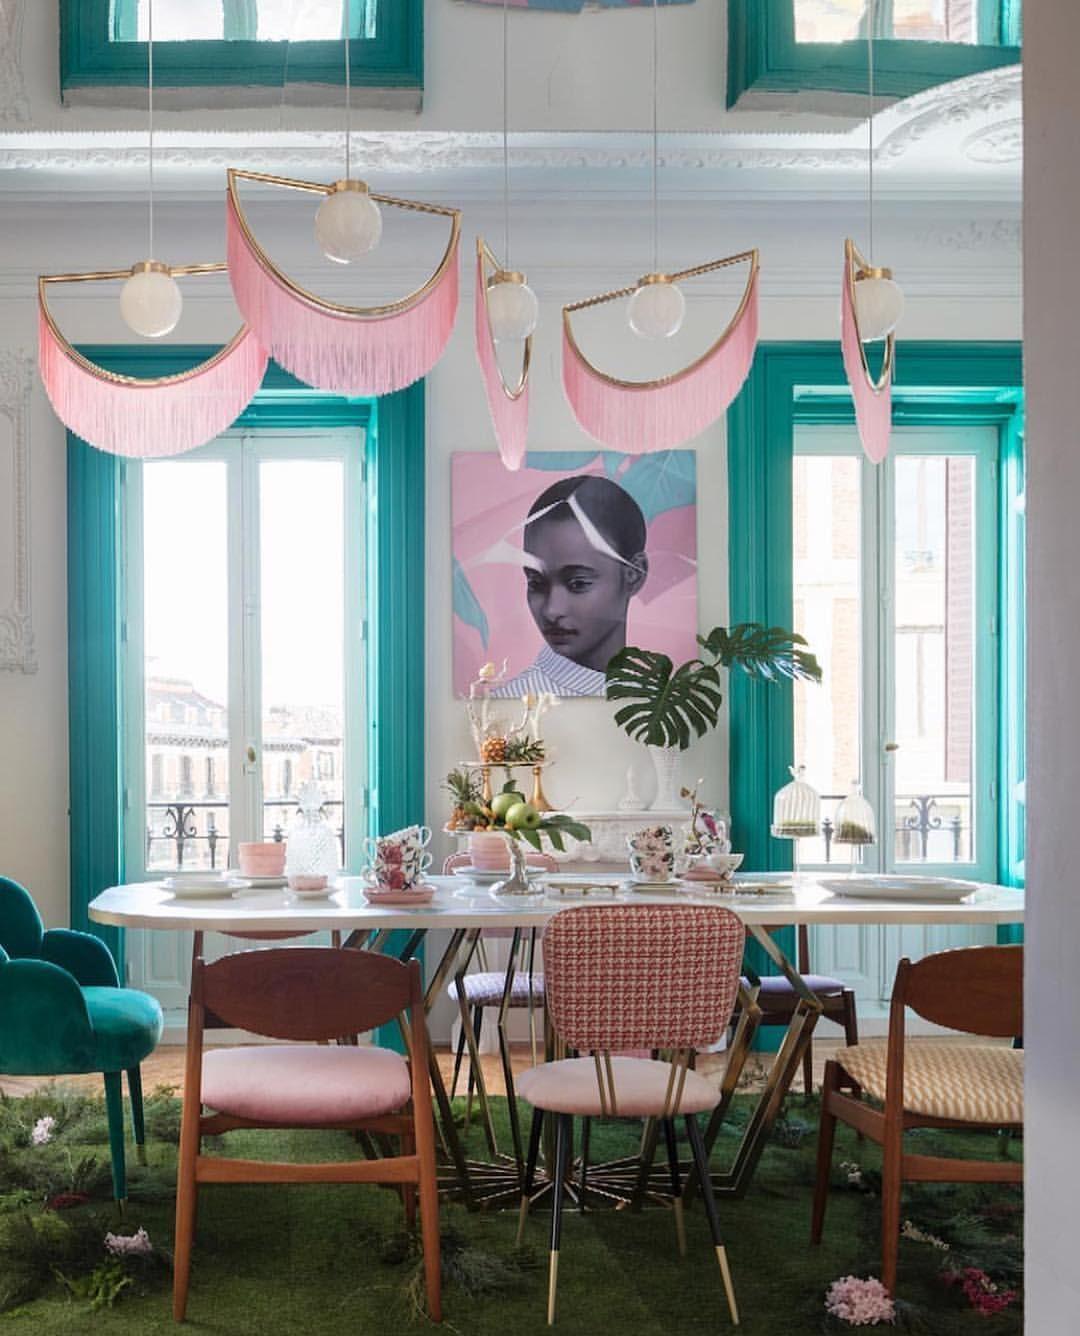 Home Design Ideas Instagram: Brandstationen Instagram : Glad Midsommar